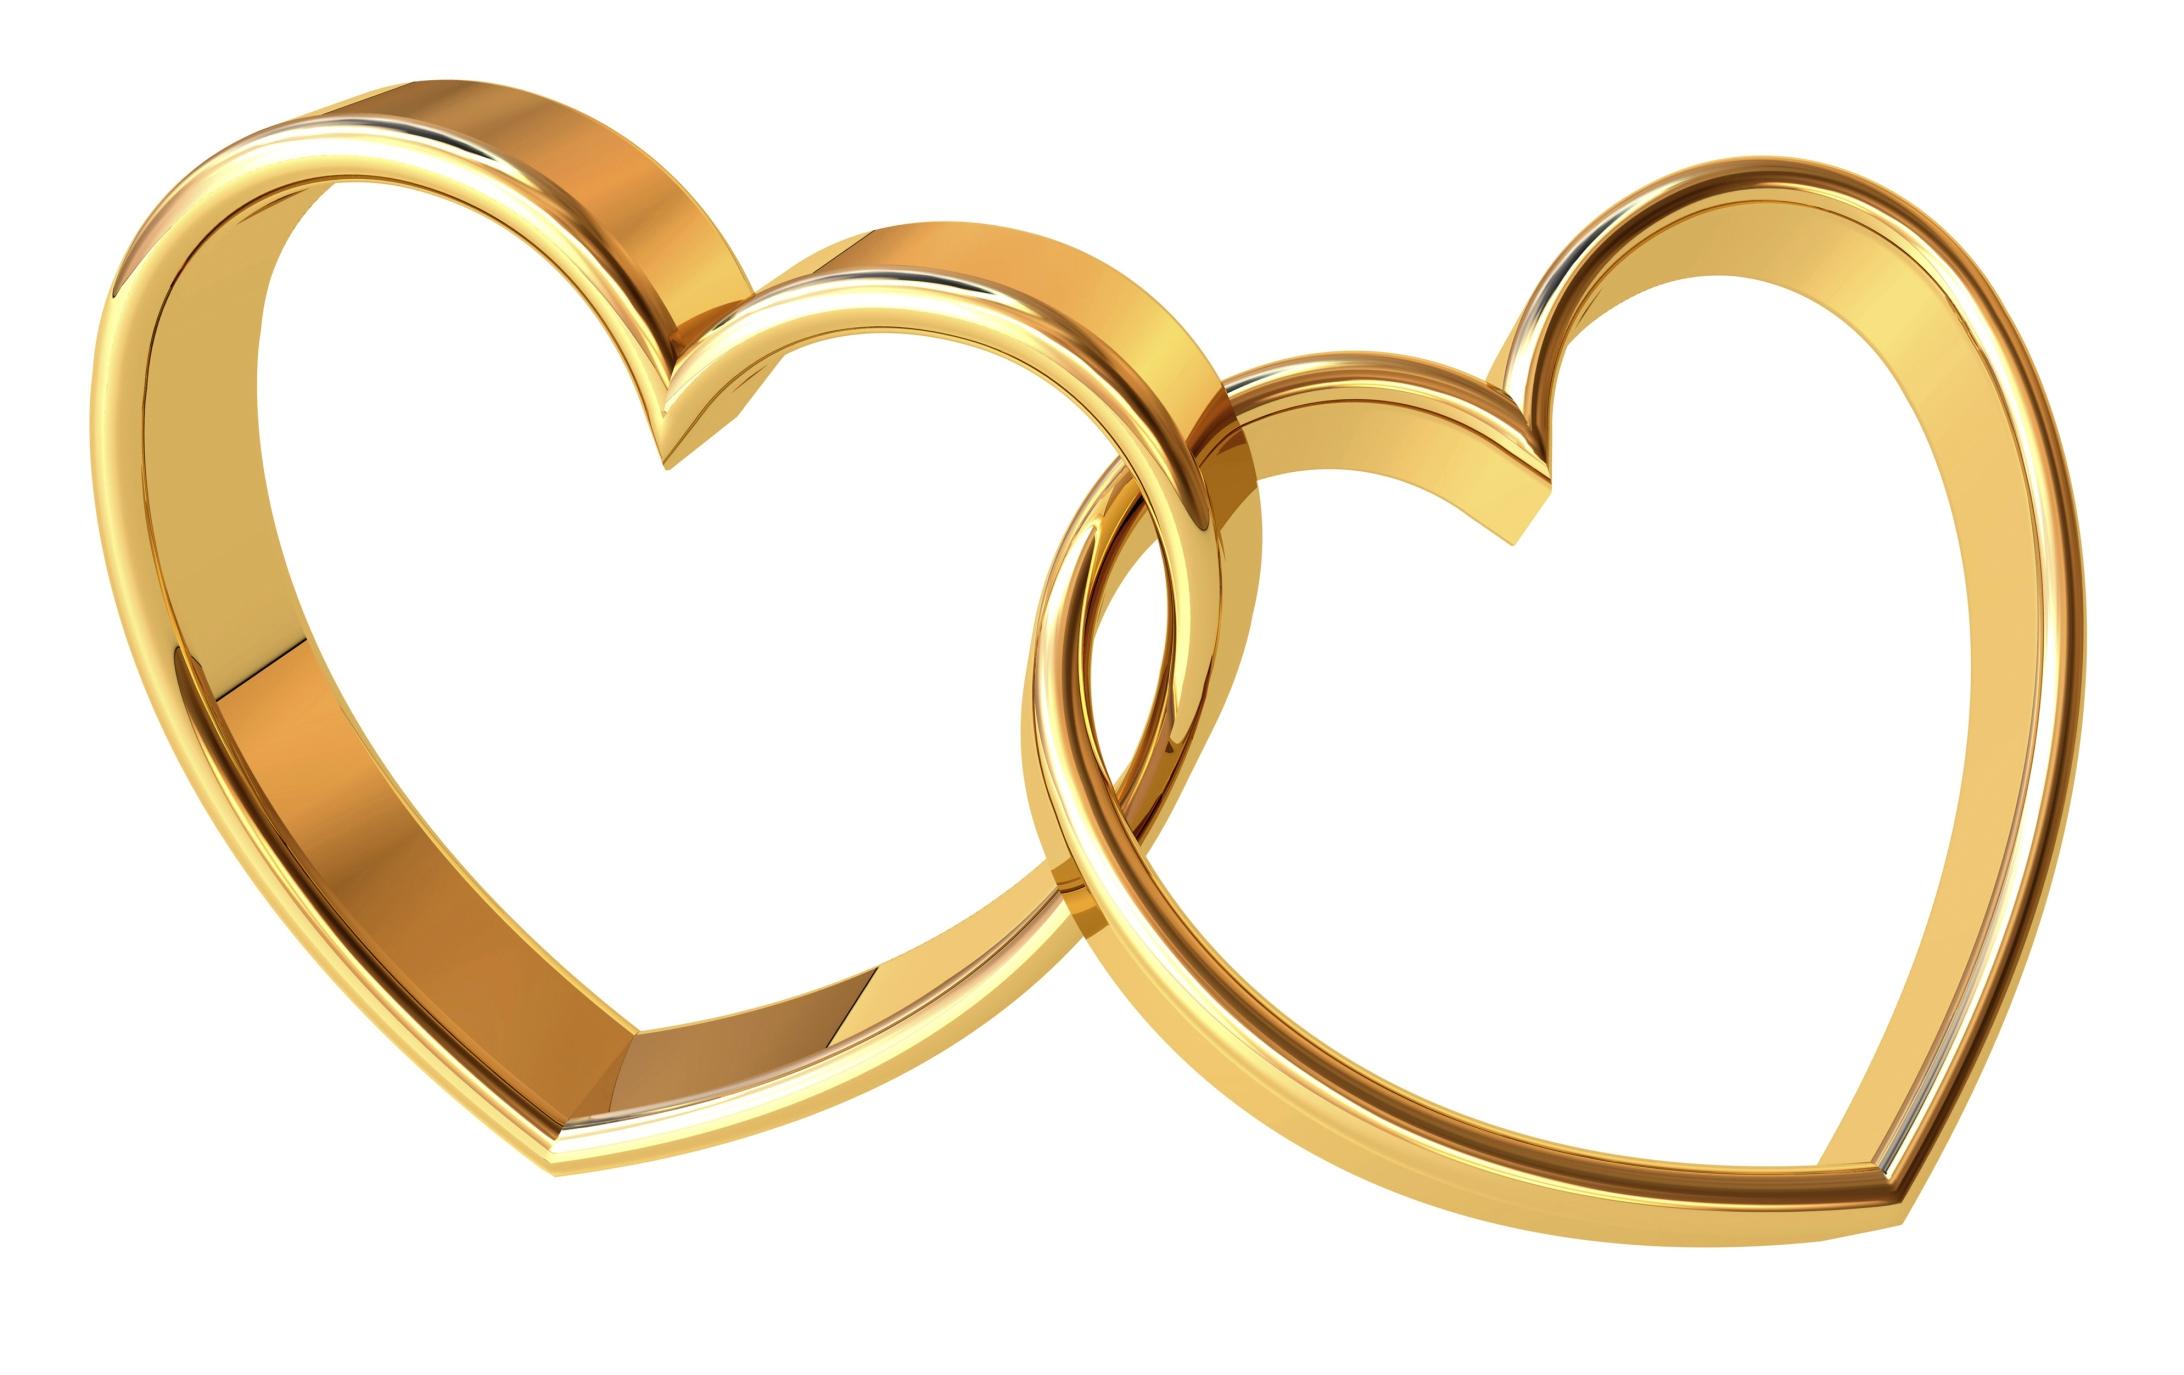 Wedding Rings Clipart u0026 Wedding Ring-Wedding Rings Clipart u0026 Wedding Rings Clip Art Images - ClipartALL clipartall.com-11